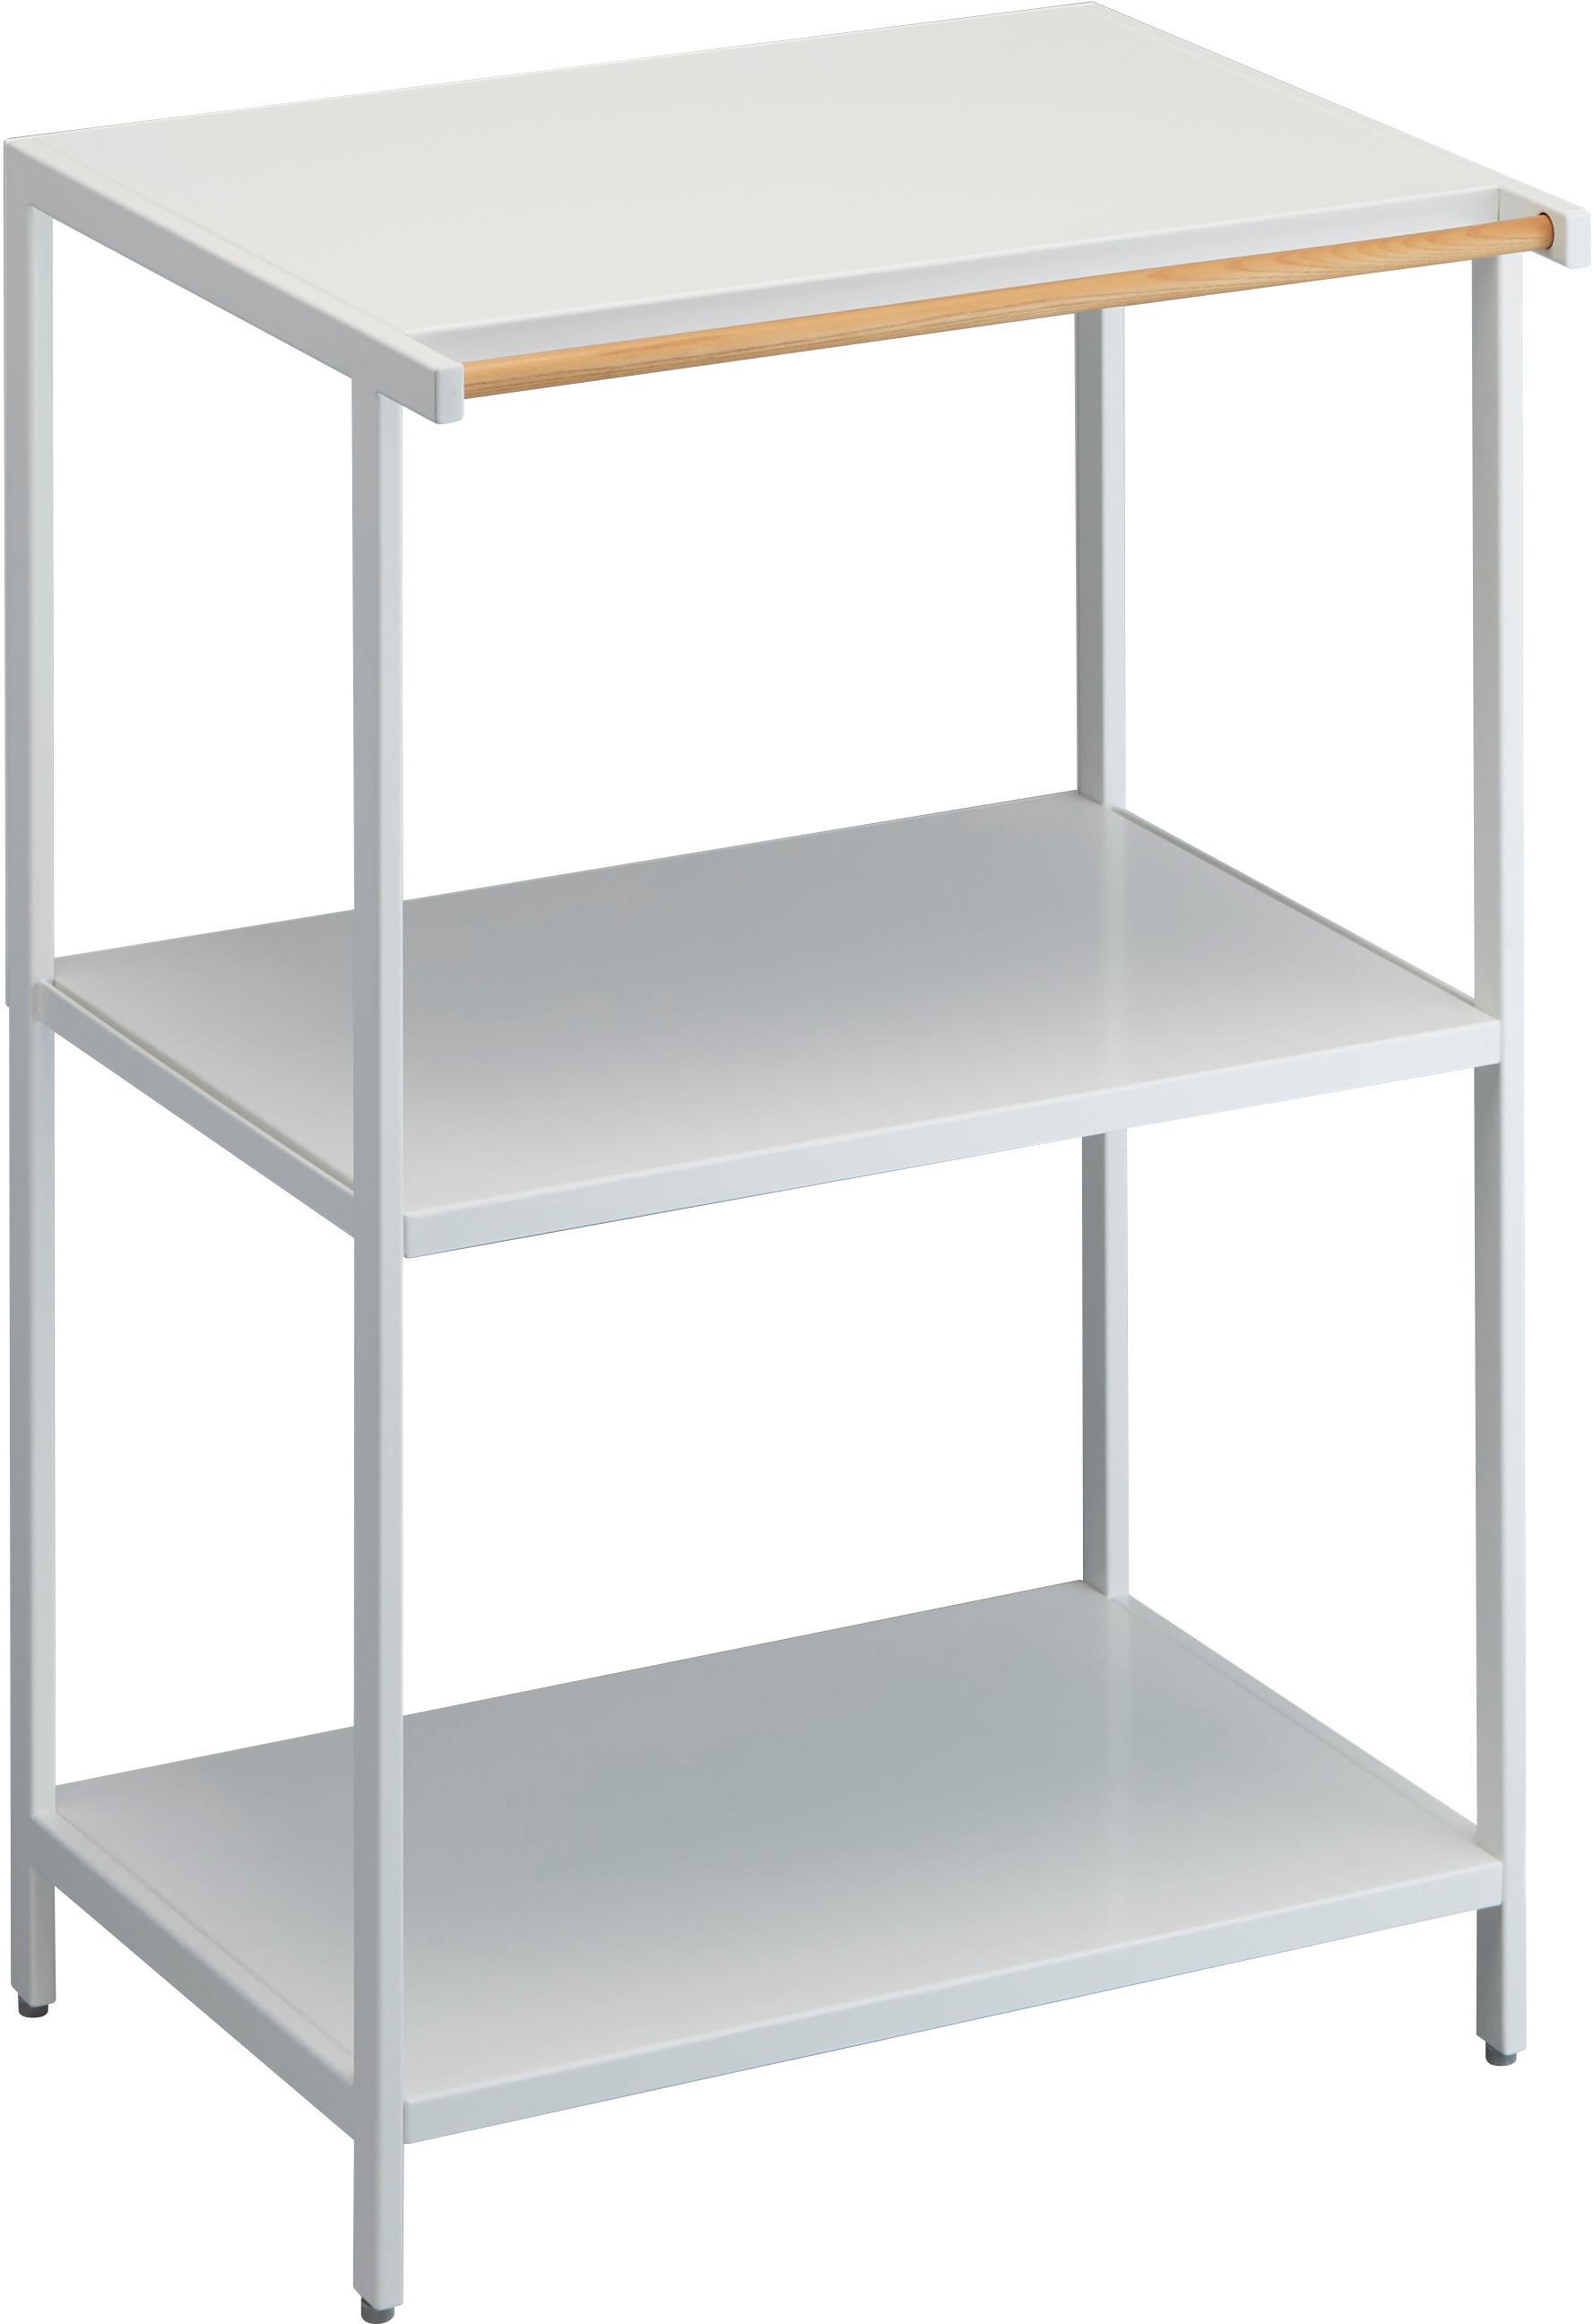 Libreria in metallo bianco Killy, Manico: legno, Bianco, Larg. 60 x Alt. 90 cm